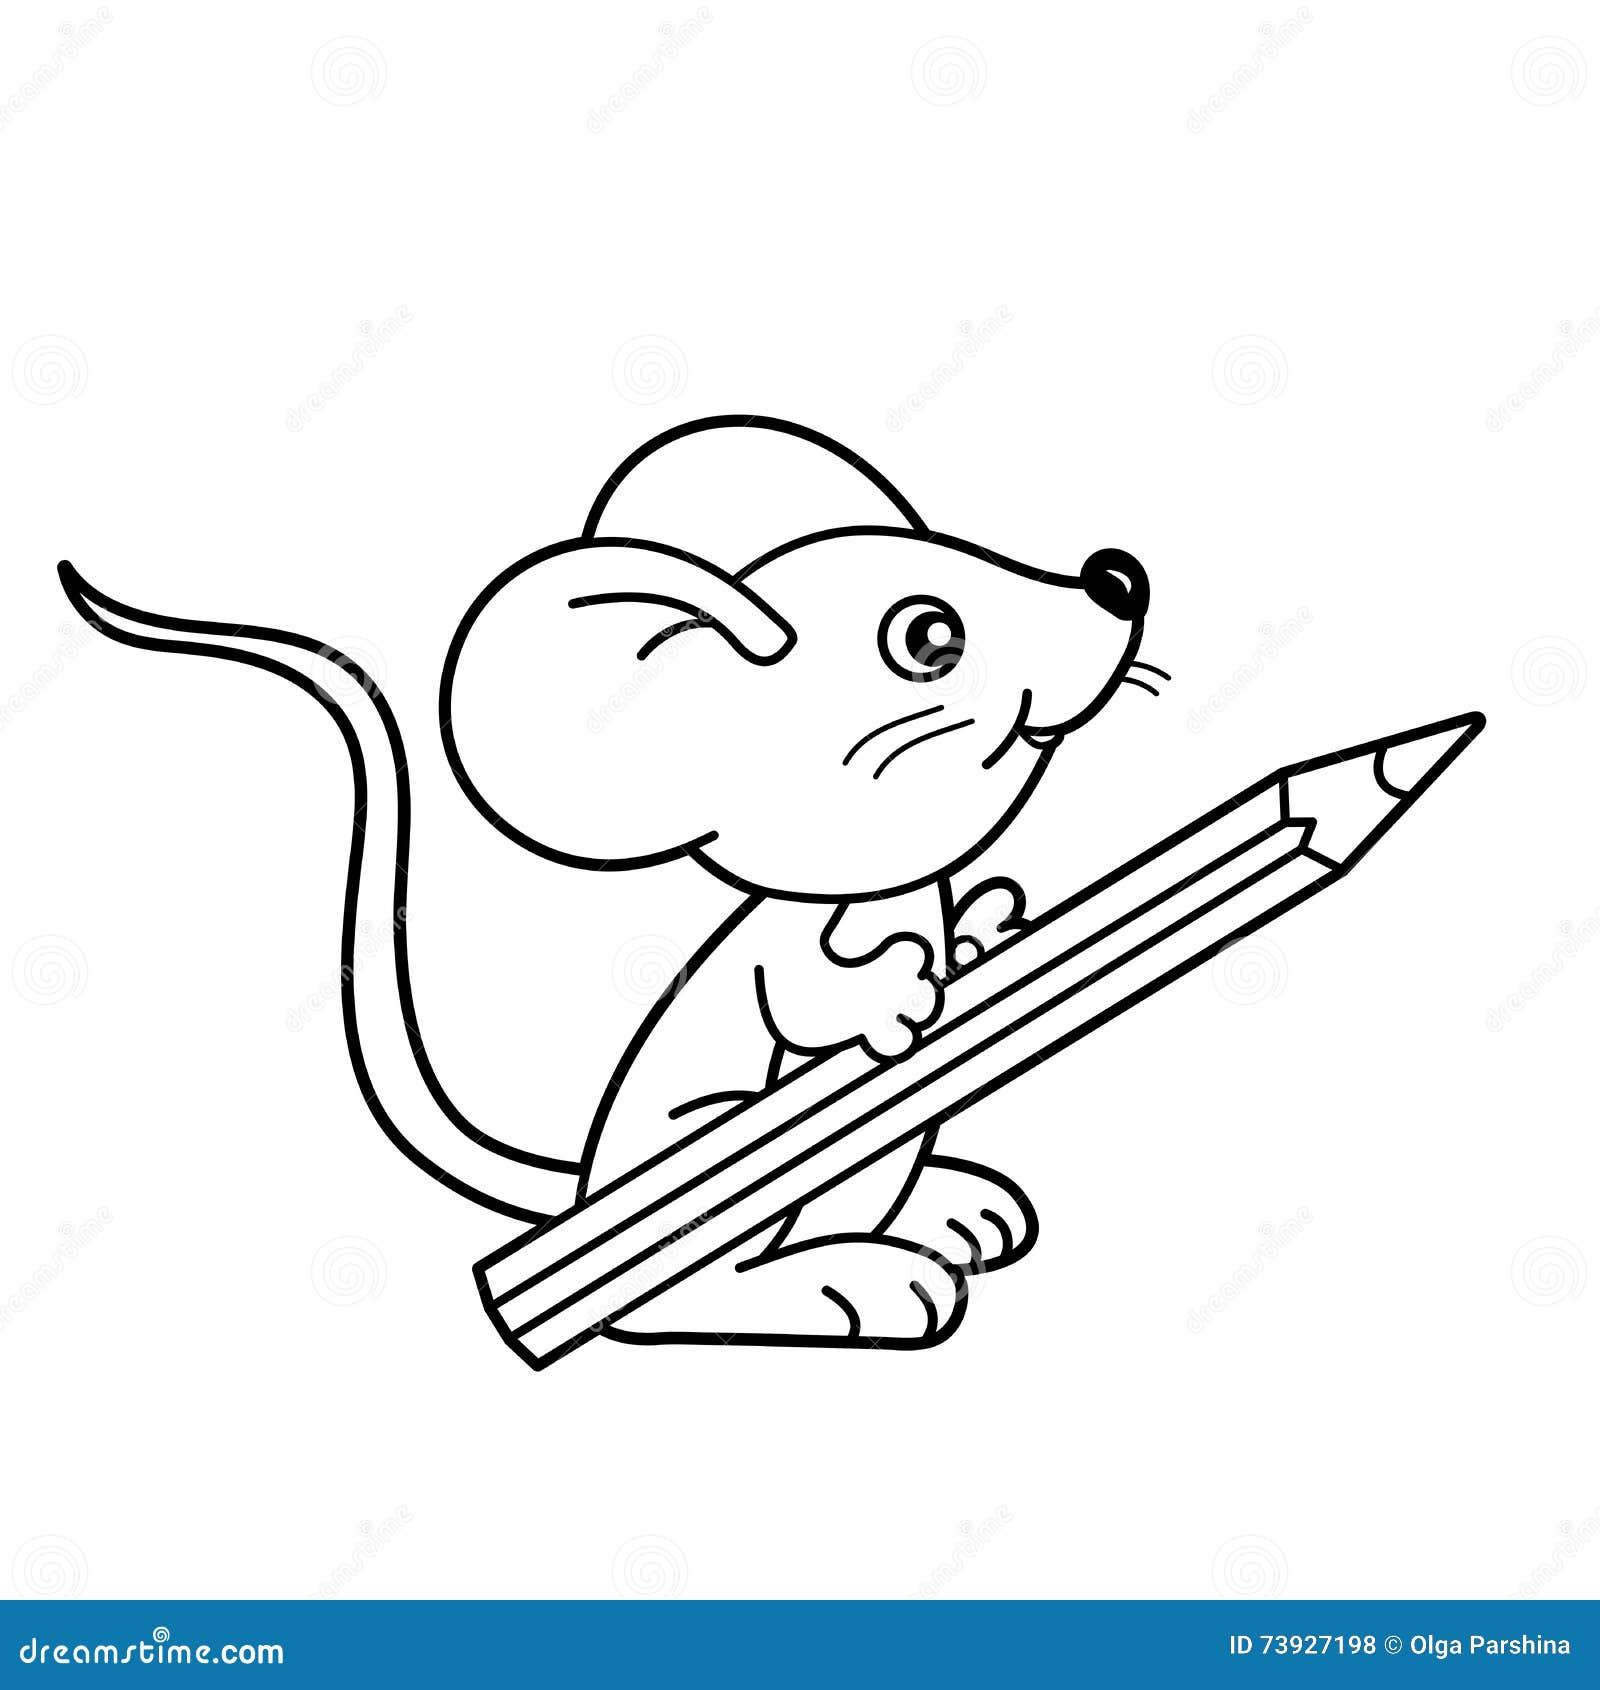 Rat fink coloring pages coloring pages - Dessin sourie ...